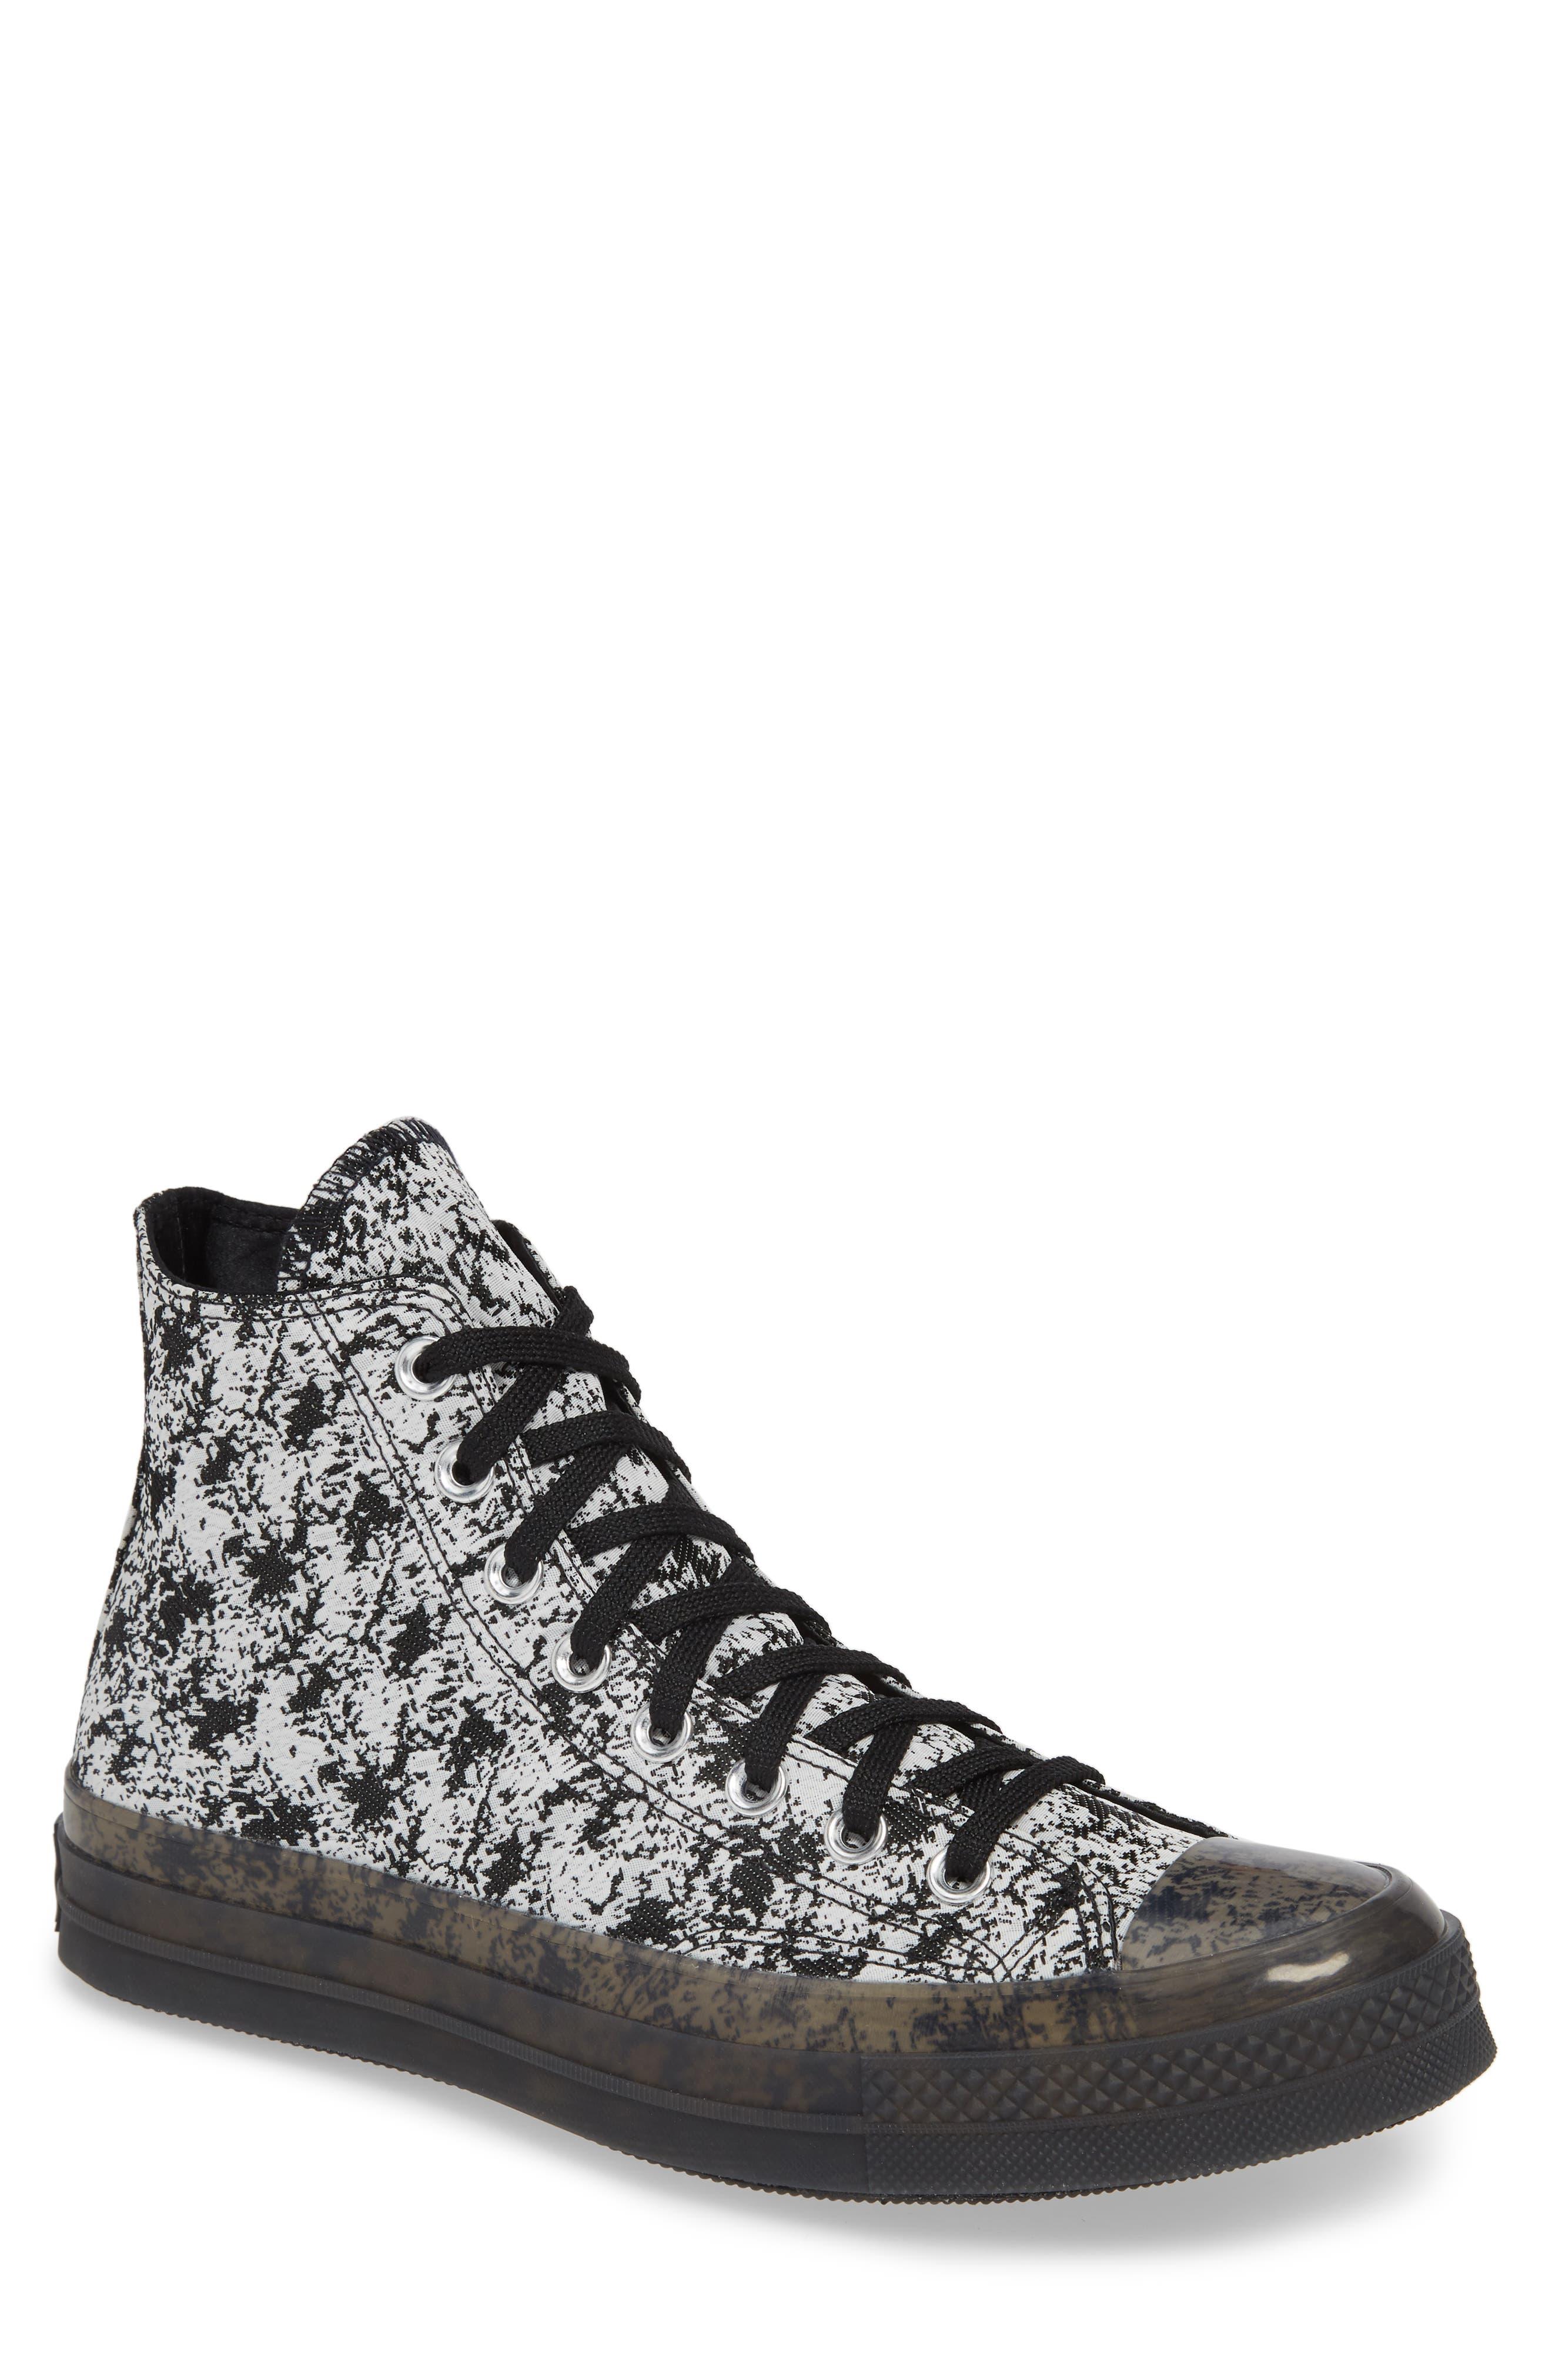 Converse Chuck Taylor All Star 70 High Top Jacquard Sneaker, Black